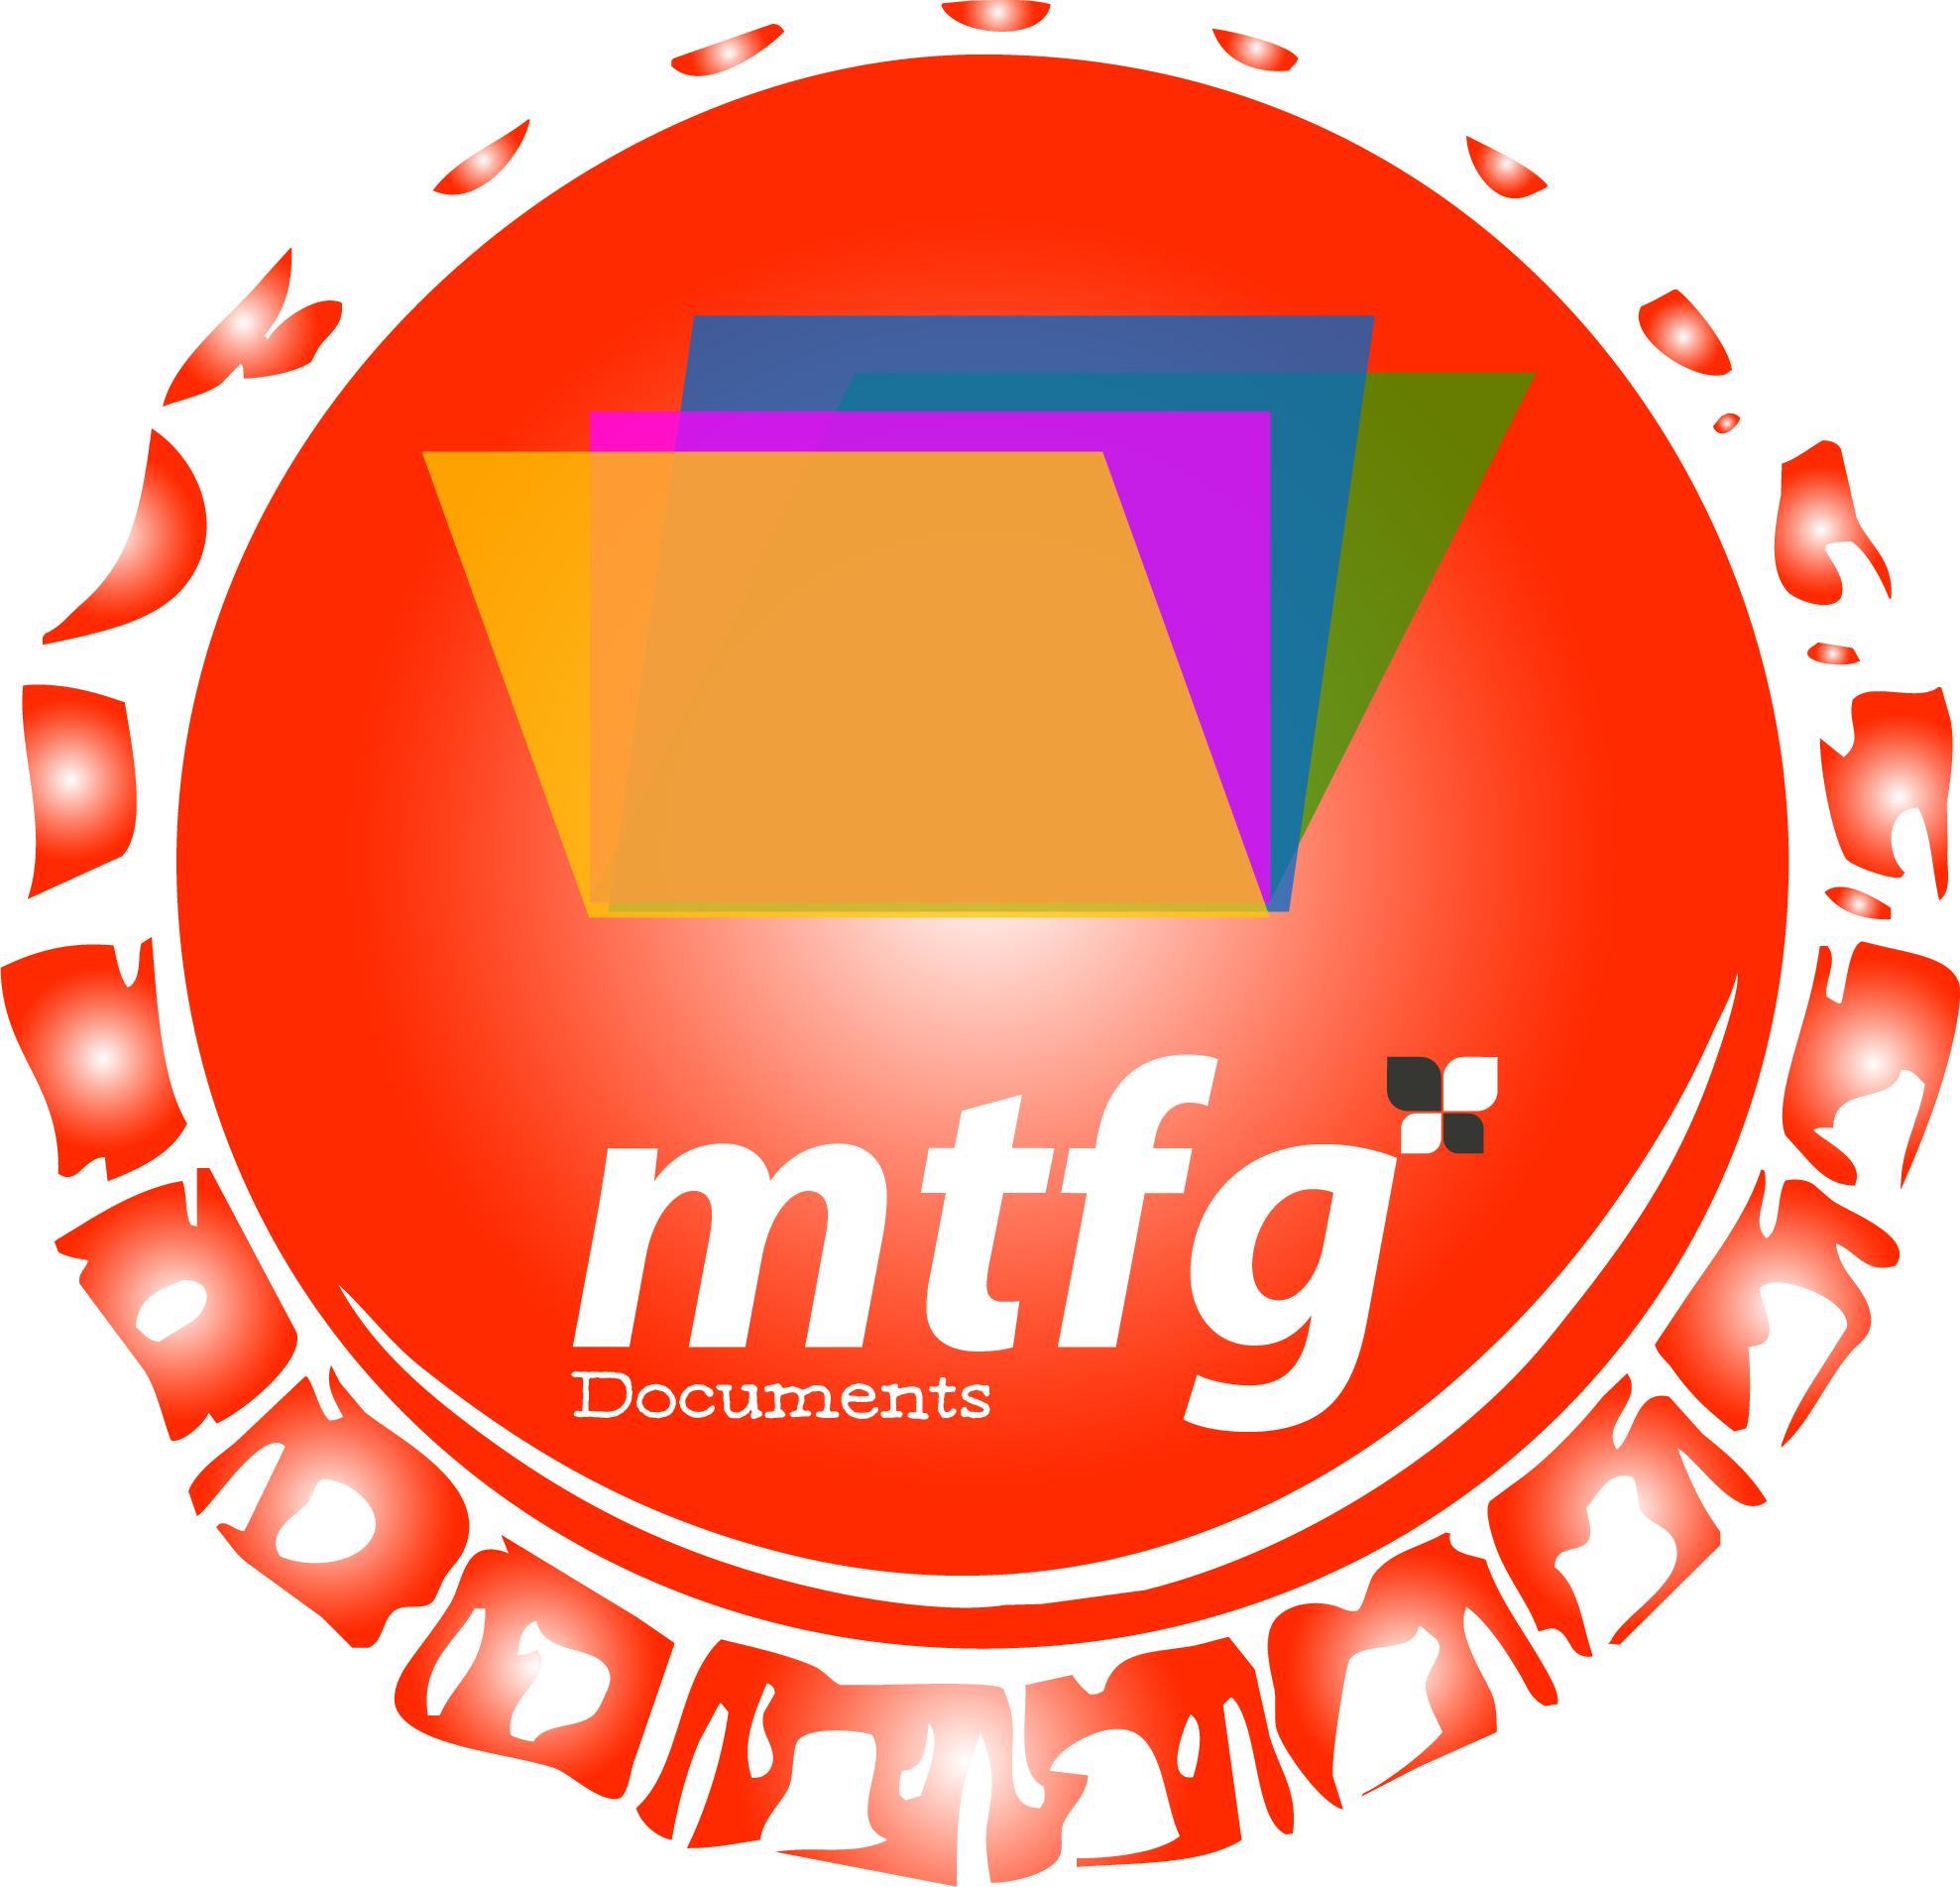 MTFG Documents